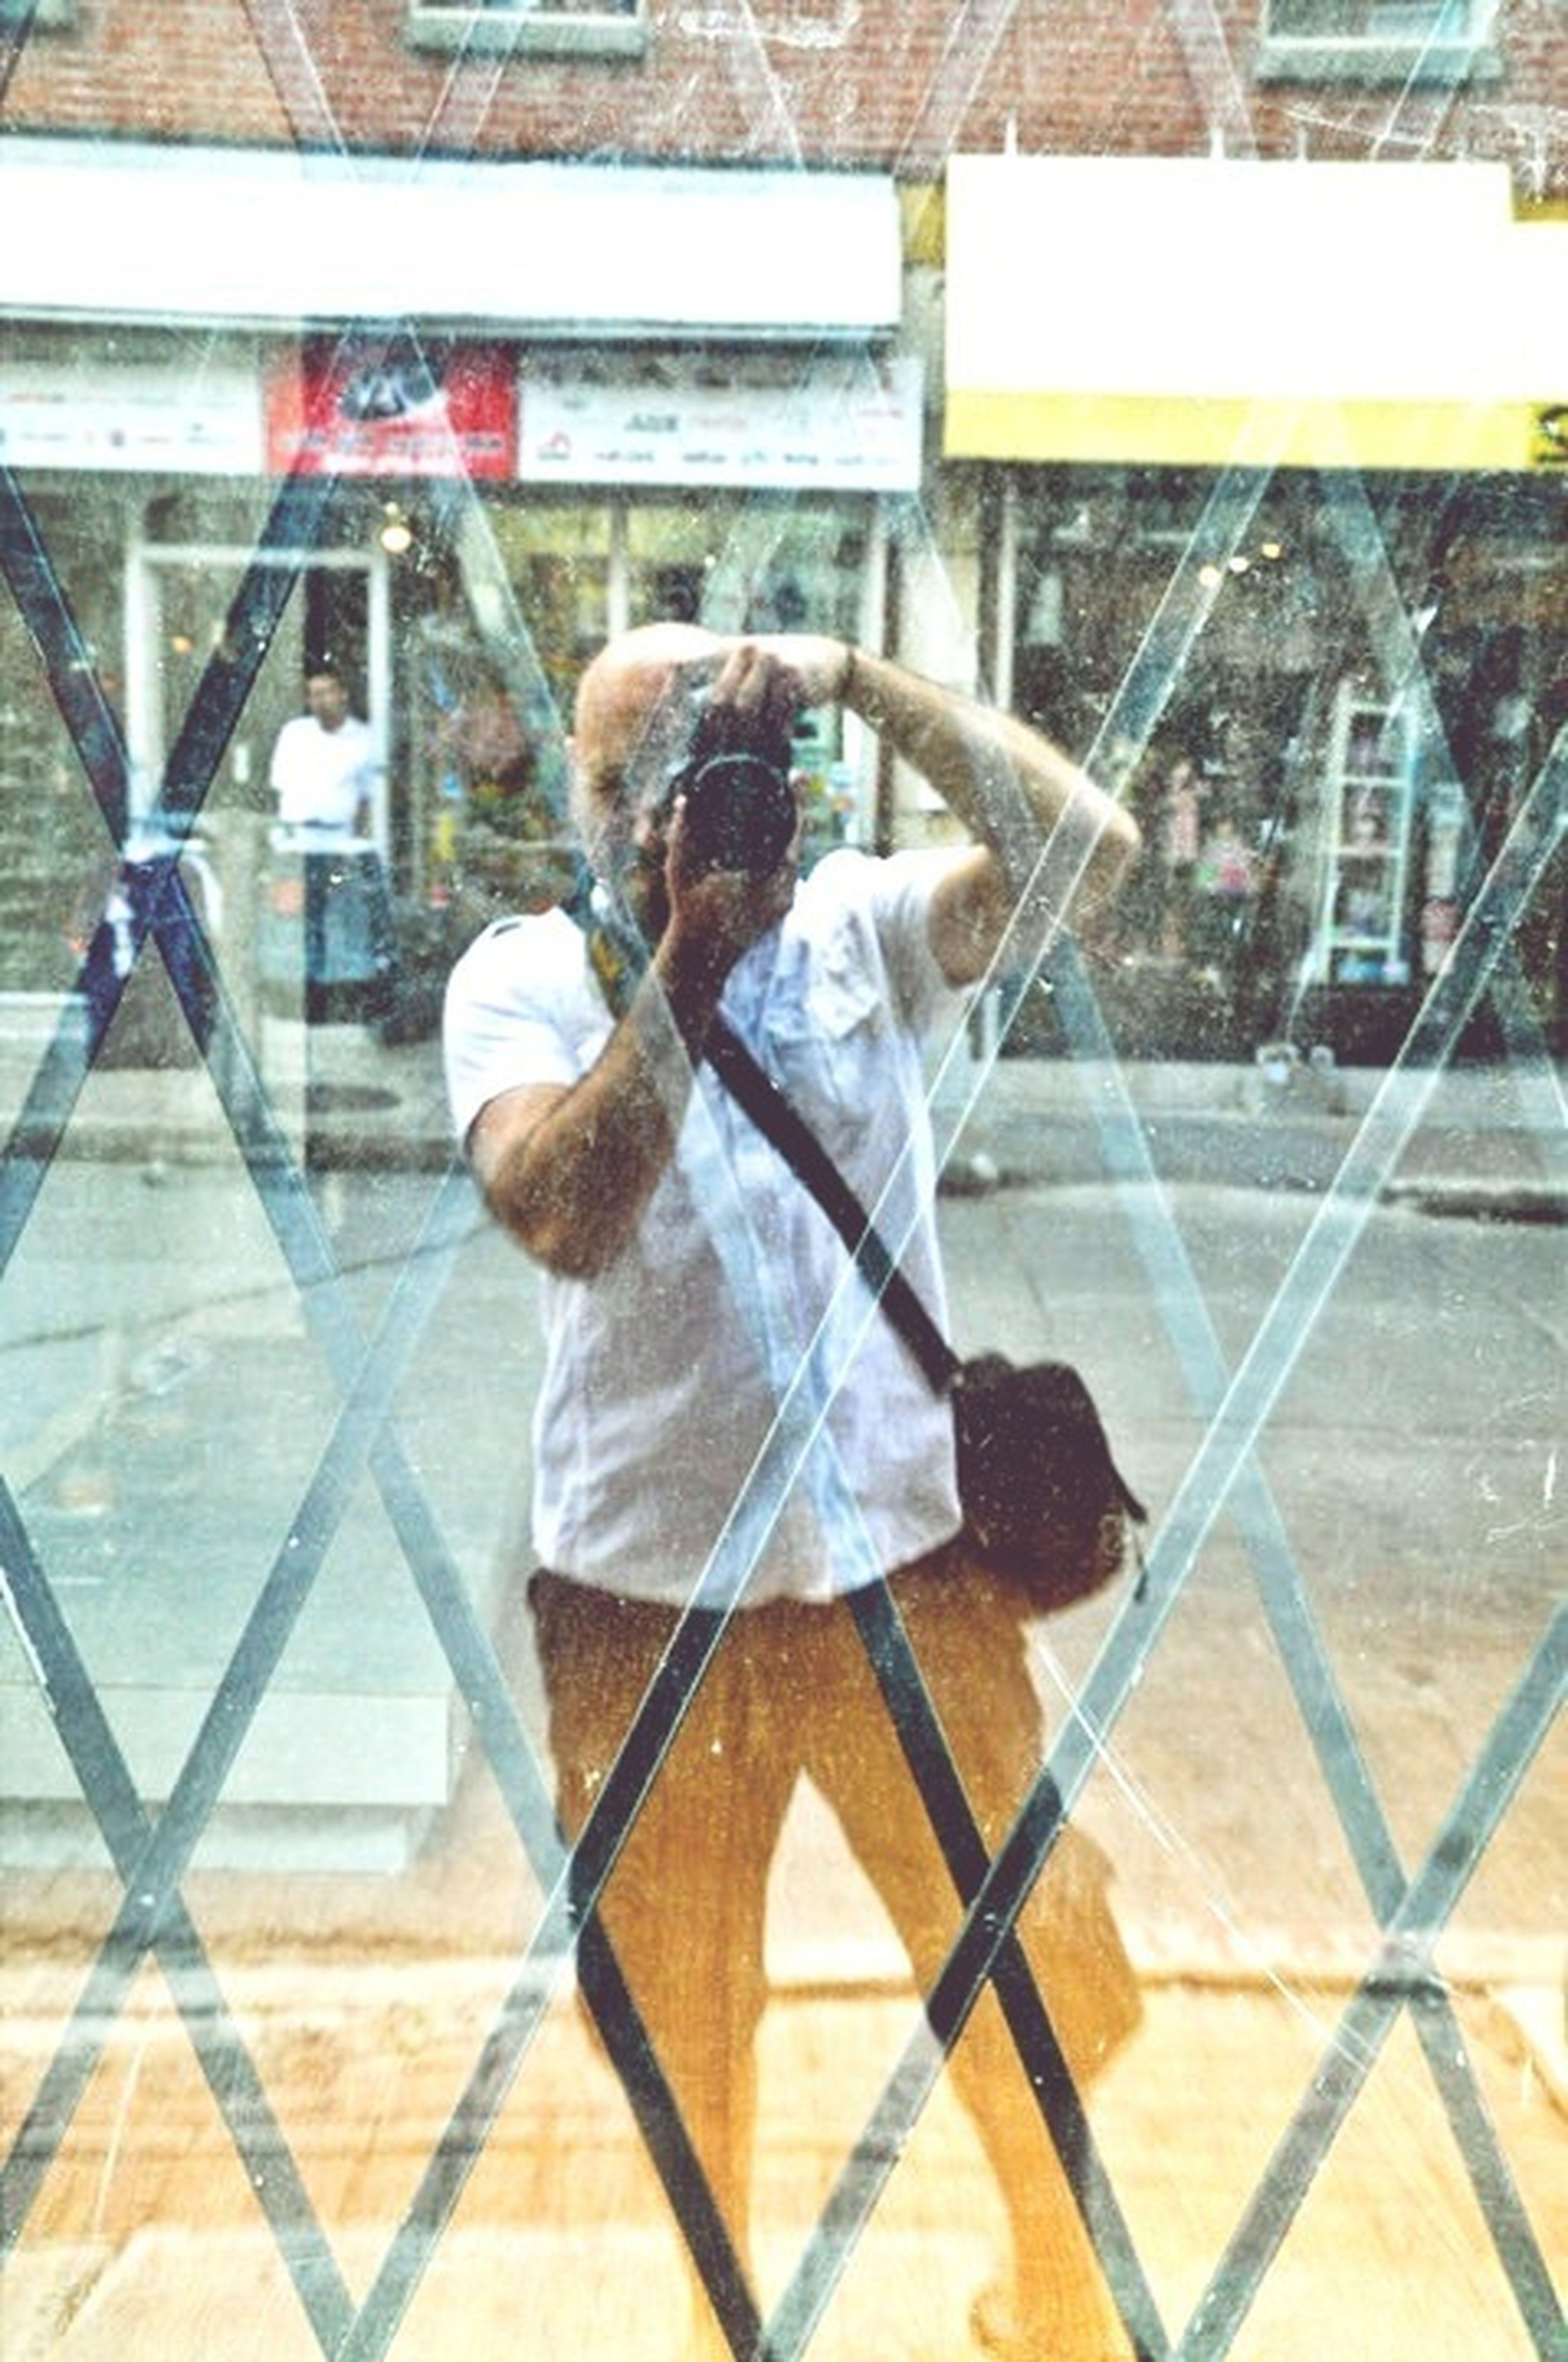 Streetphotography Taking Photos Selfportrait Eye4photography